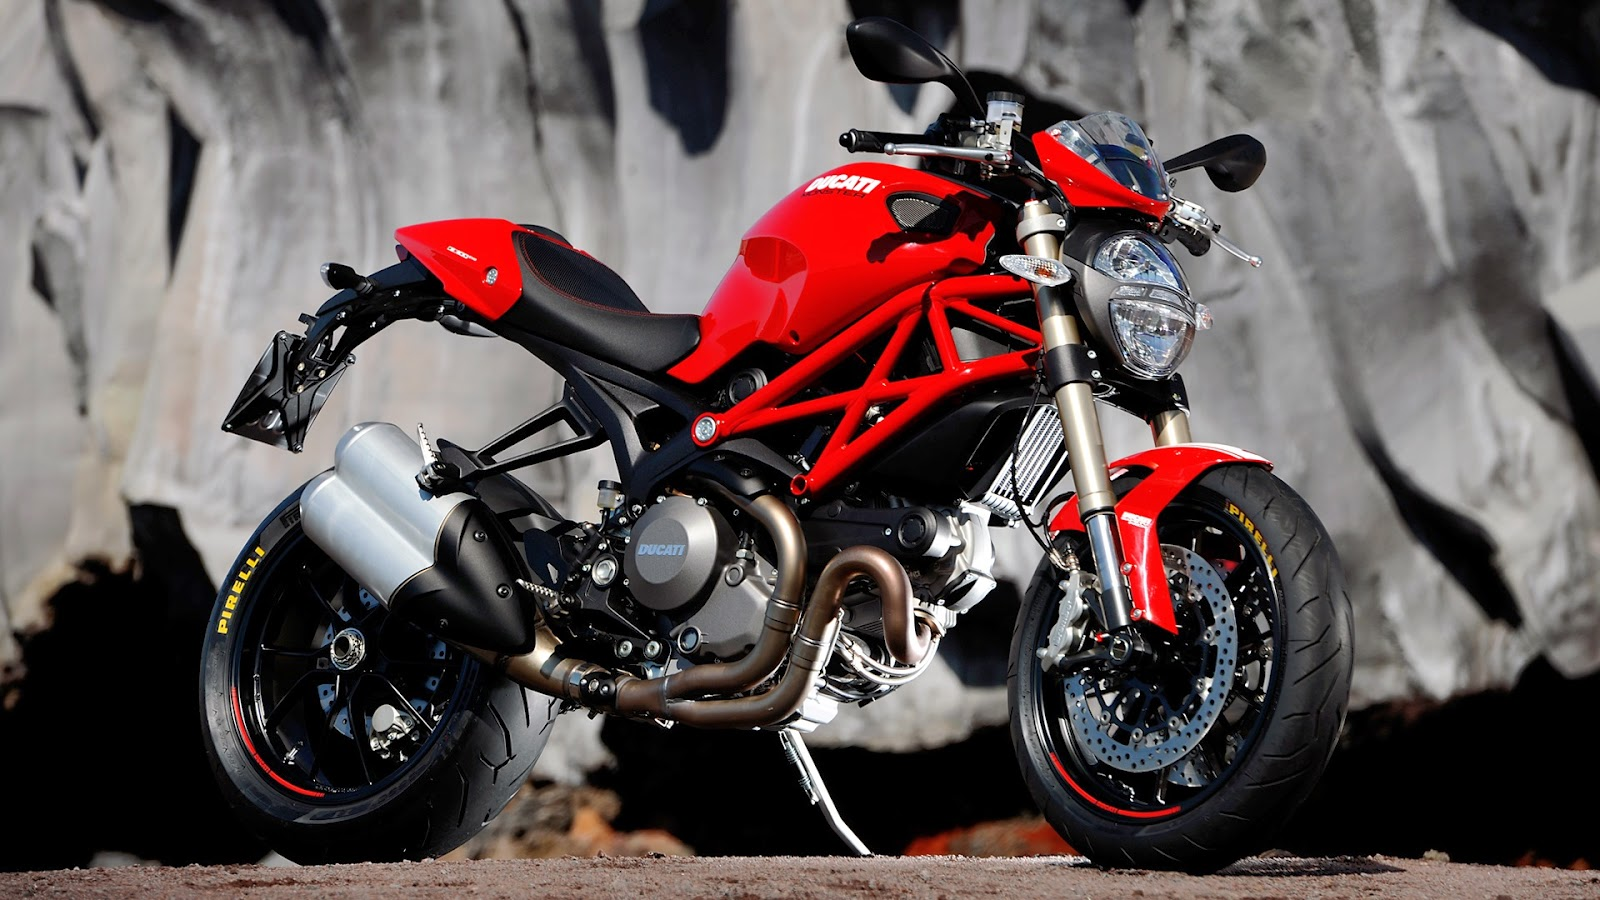 Ducati Monster Motorcycles